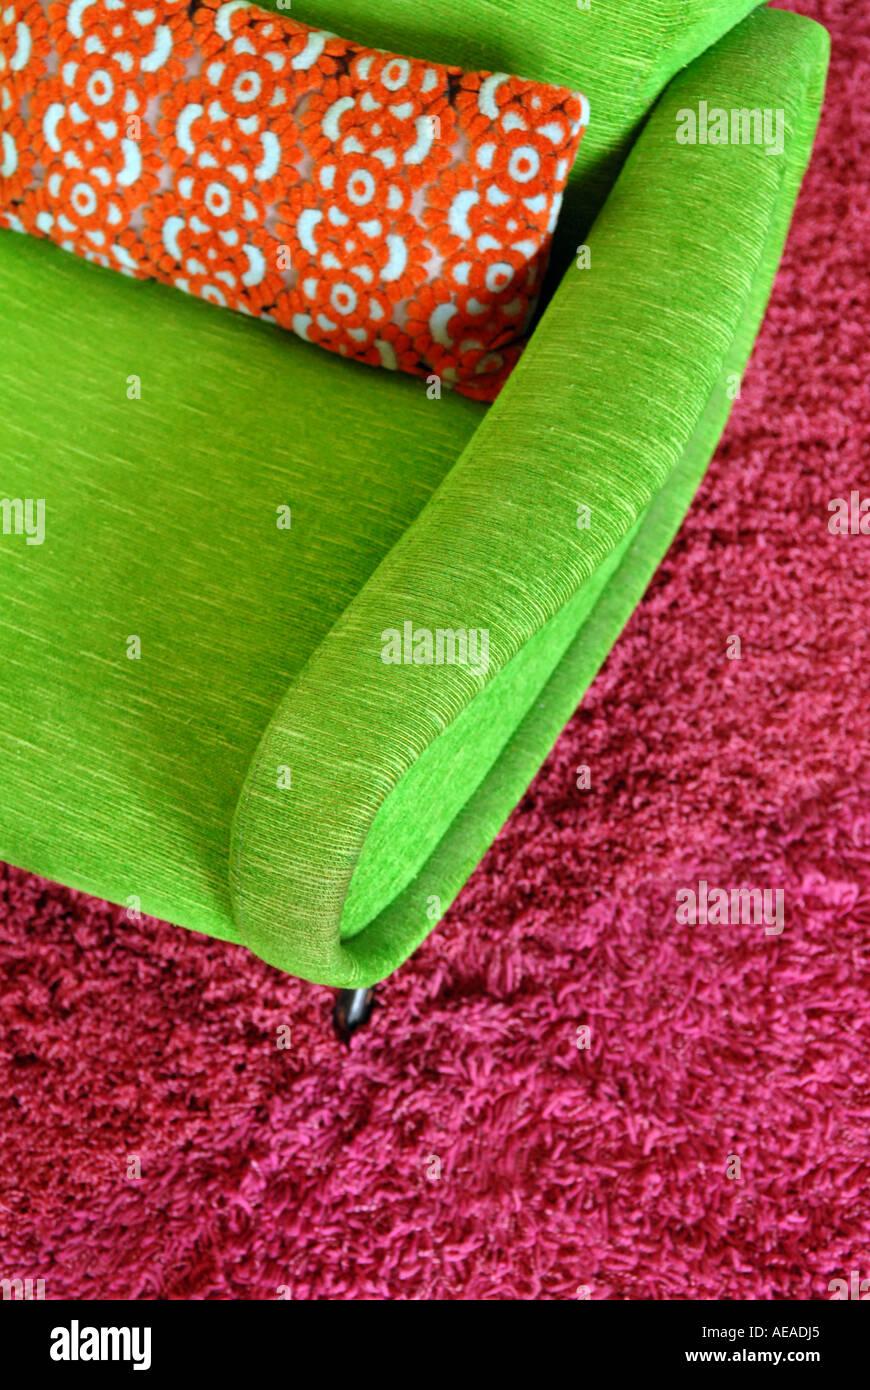 Green seventies chair on Purple shag pile carpet. - Stock Image